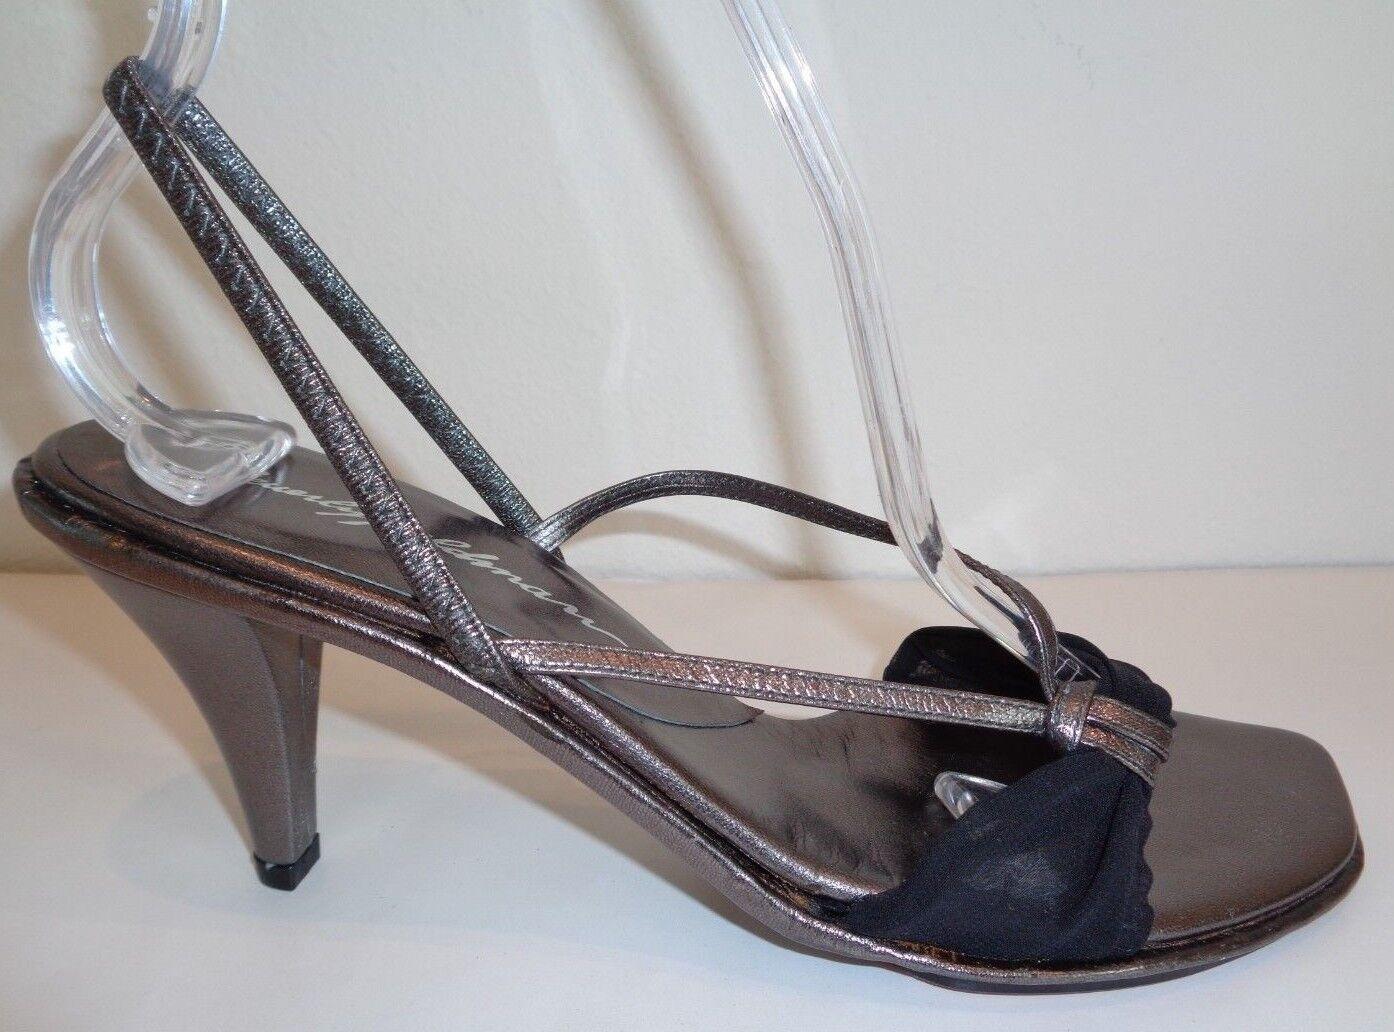 Beverly Feldman Talla 7 Tacos Sandalias Sandalias Sandalias De Gasa Tire Negro Nuevo Zapatos para mujer  venta mundialmente famosa en línea